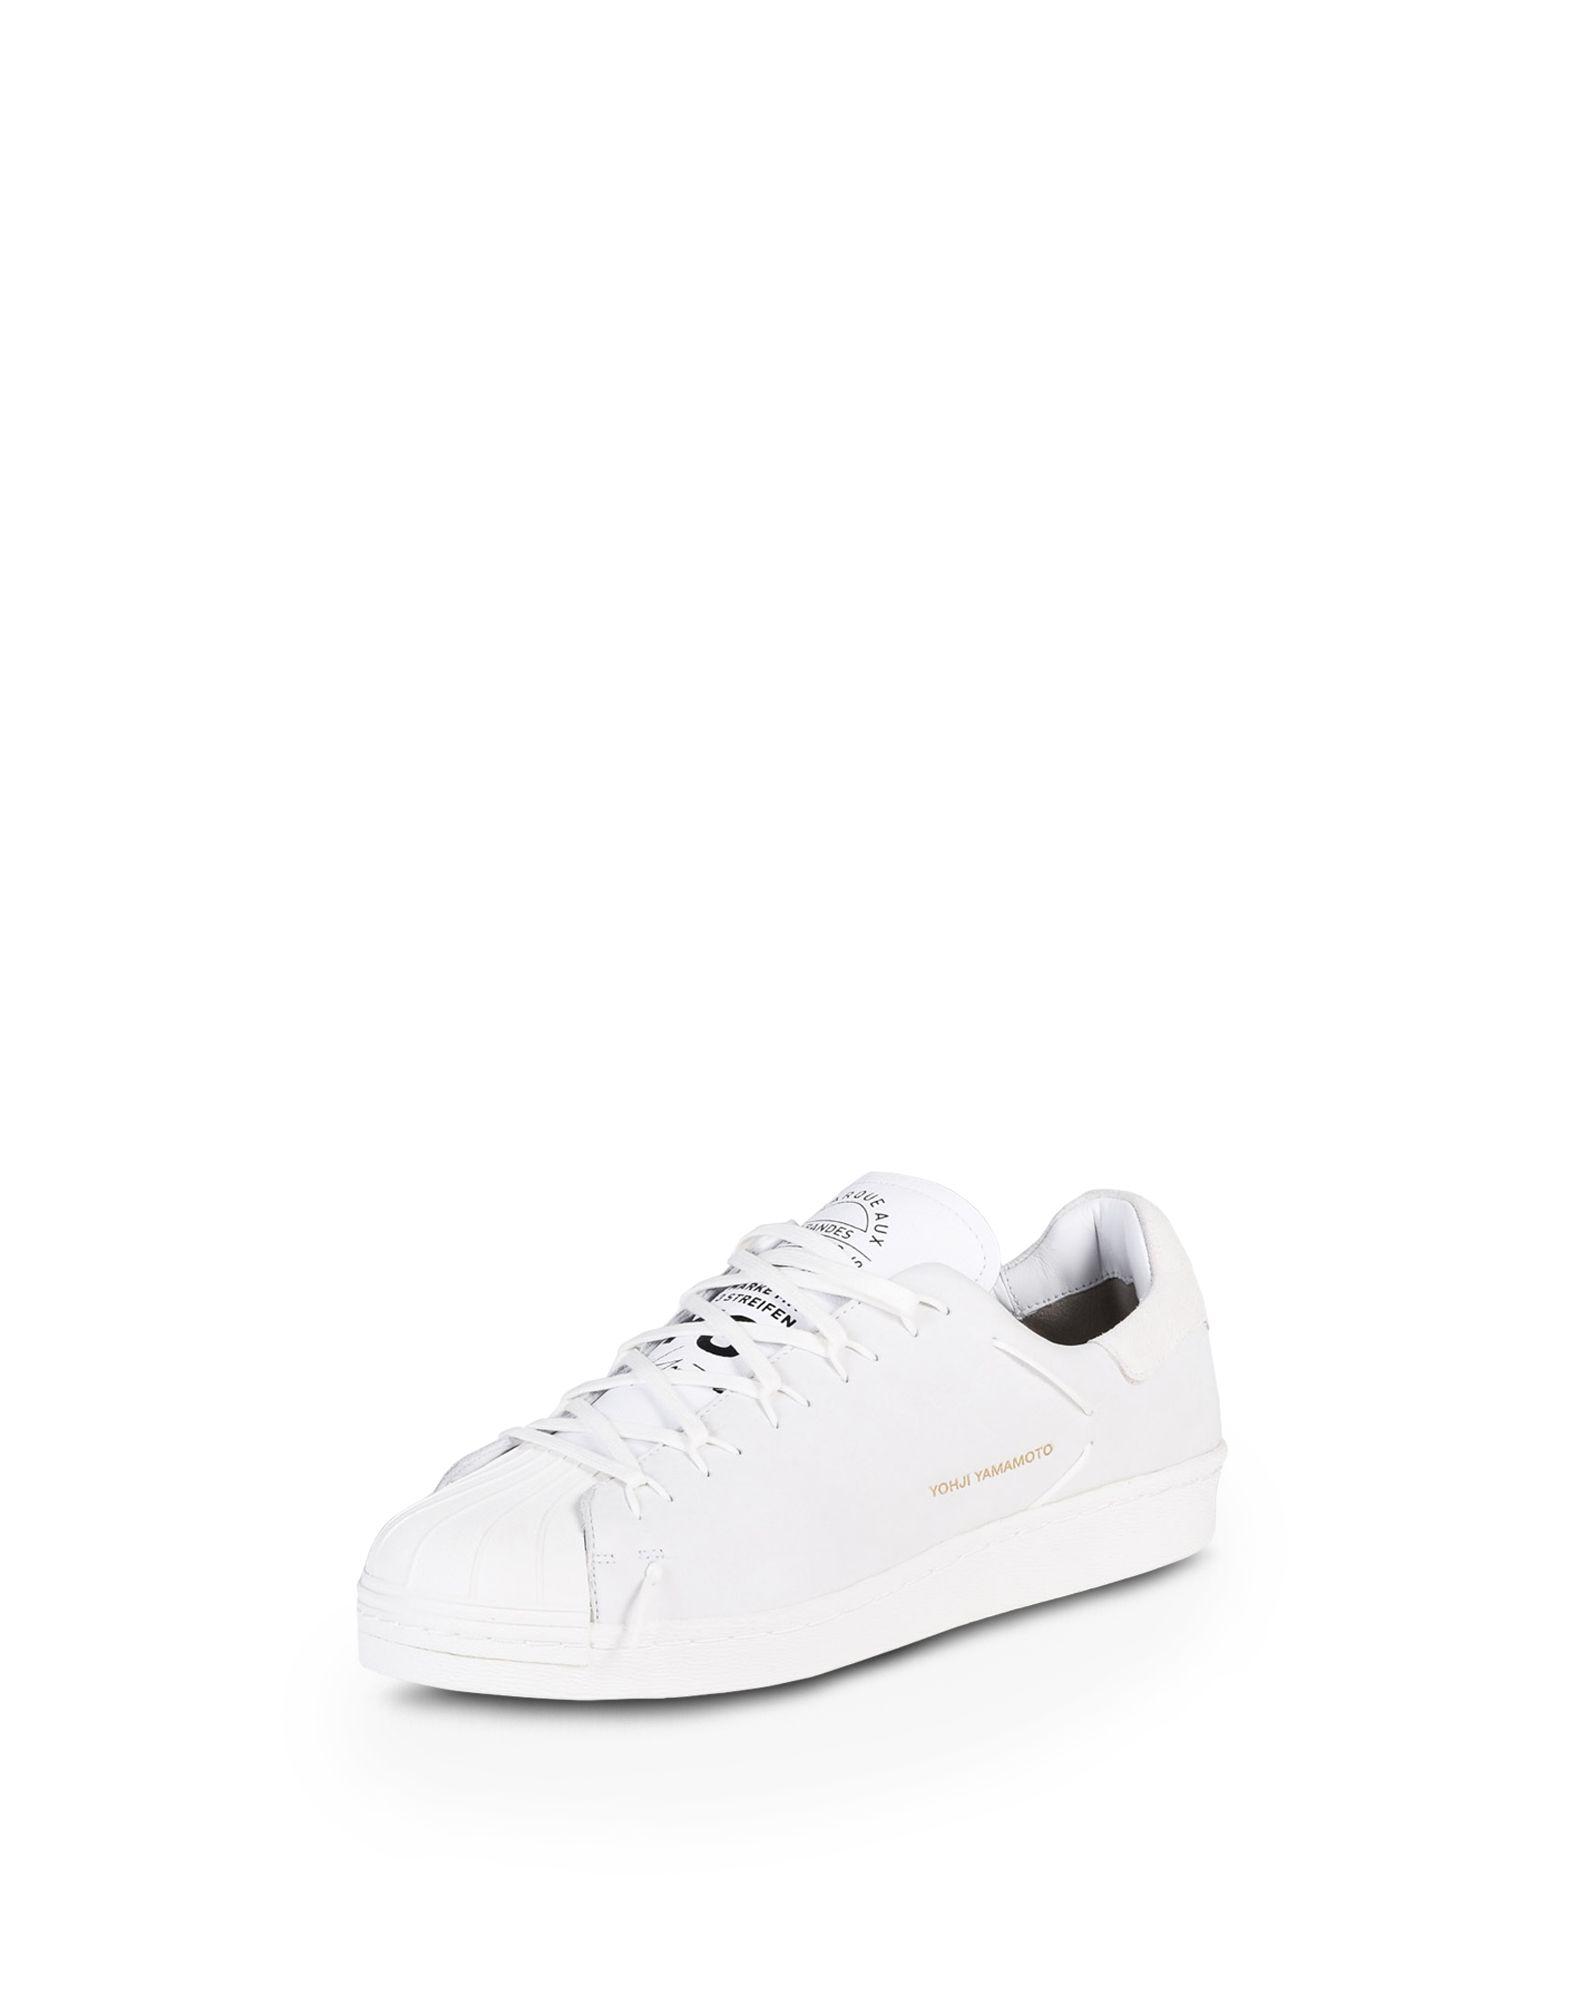 Sneakers SUPER KNOT suede grey leather white Yohji Yamamoto Ci2wjUnnb